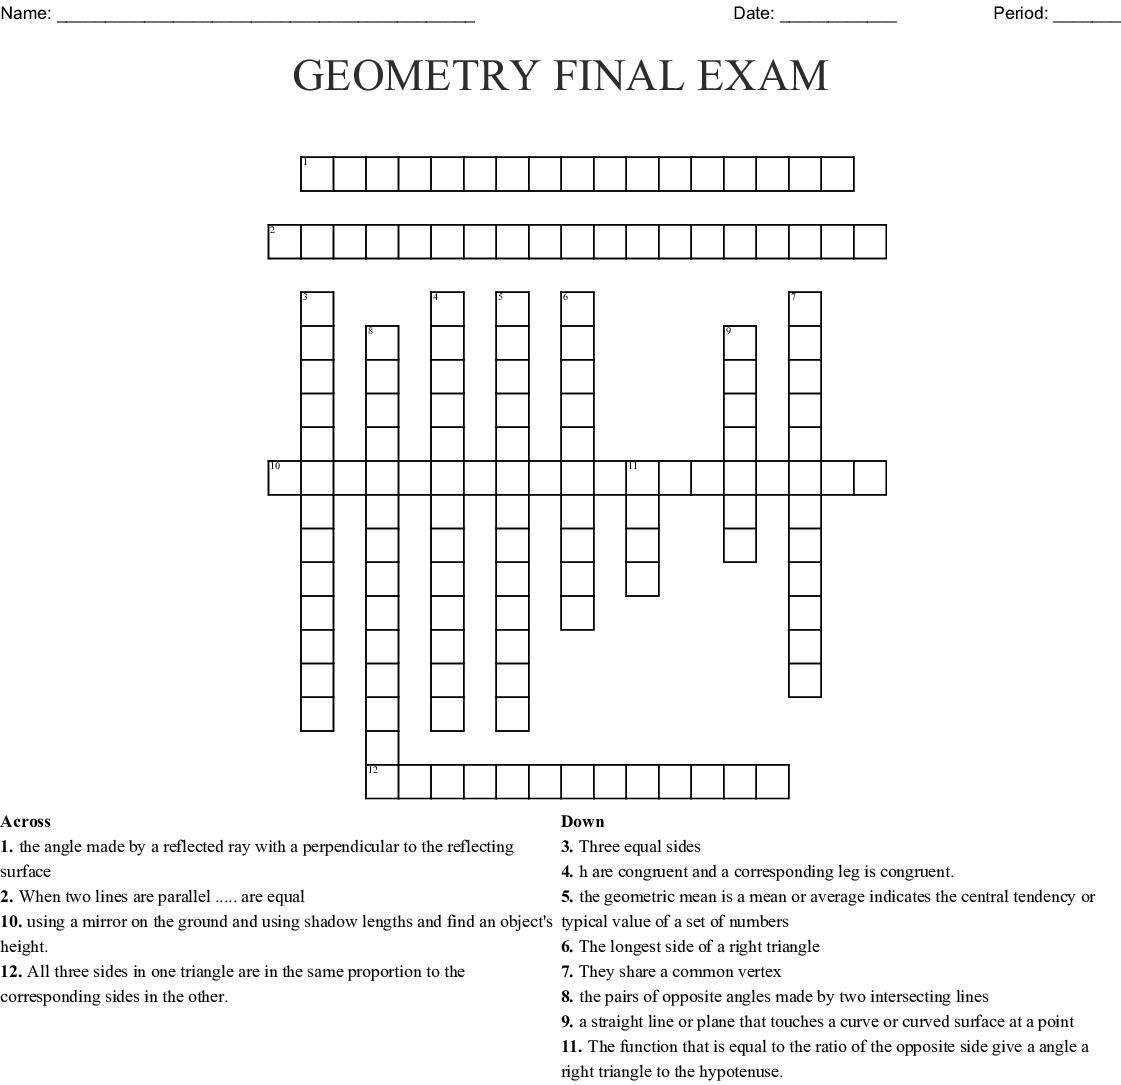 Mathematics Crosswords, Word Searches, Bingo Cards - WordMint